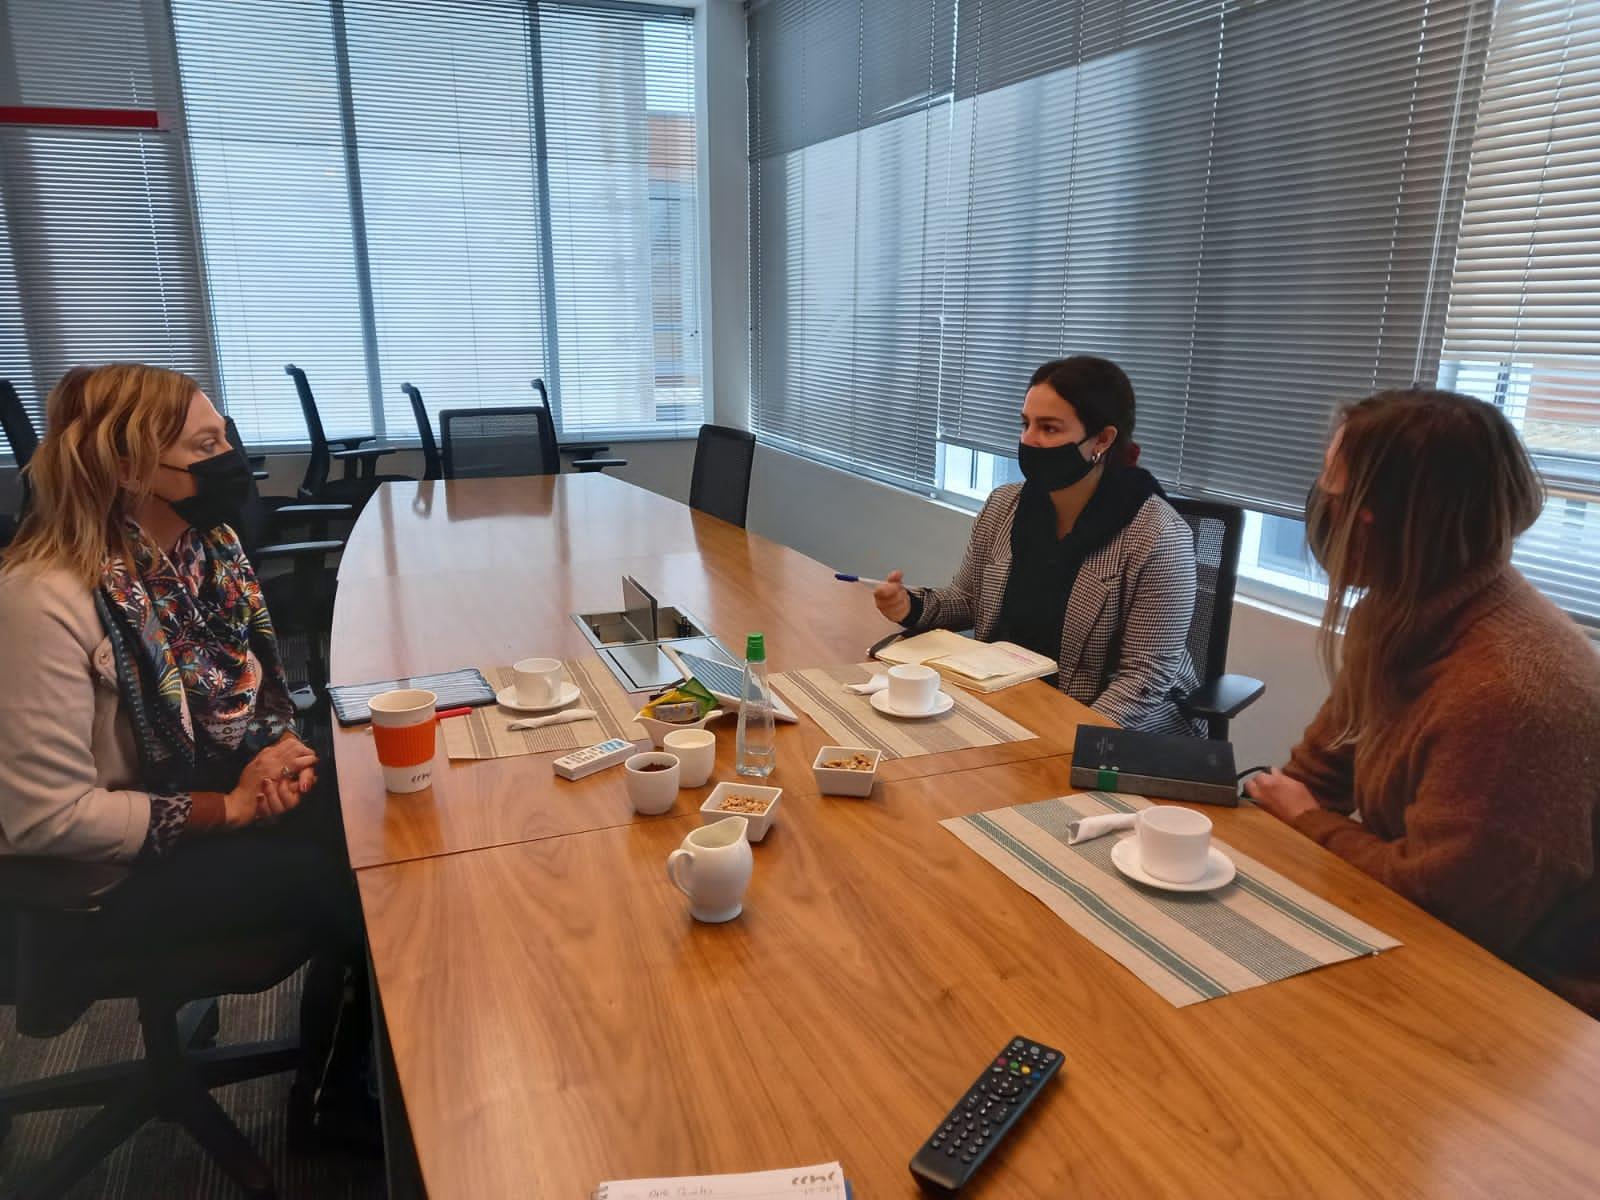 Presidenta CChC Valdivia se reúne con ONG Canales noticias